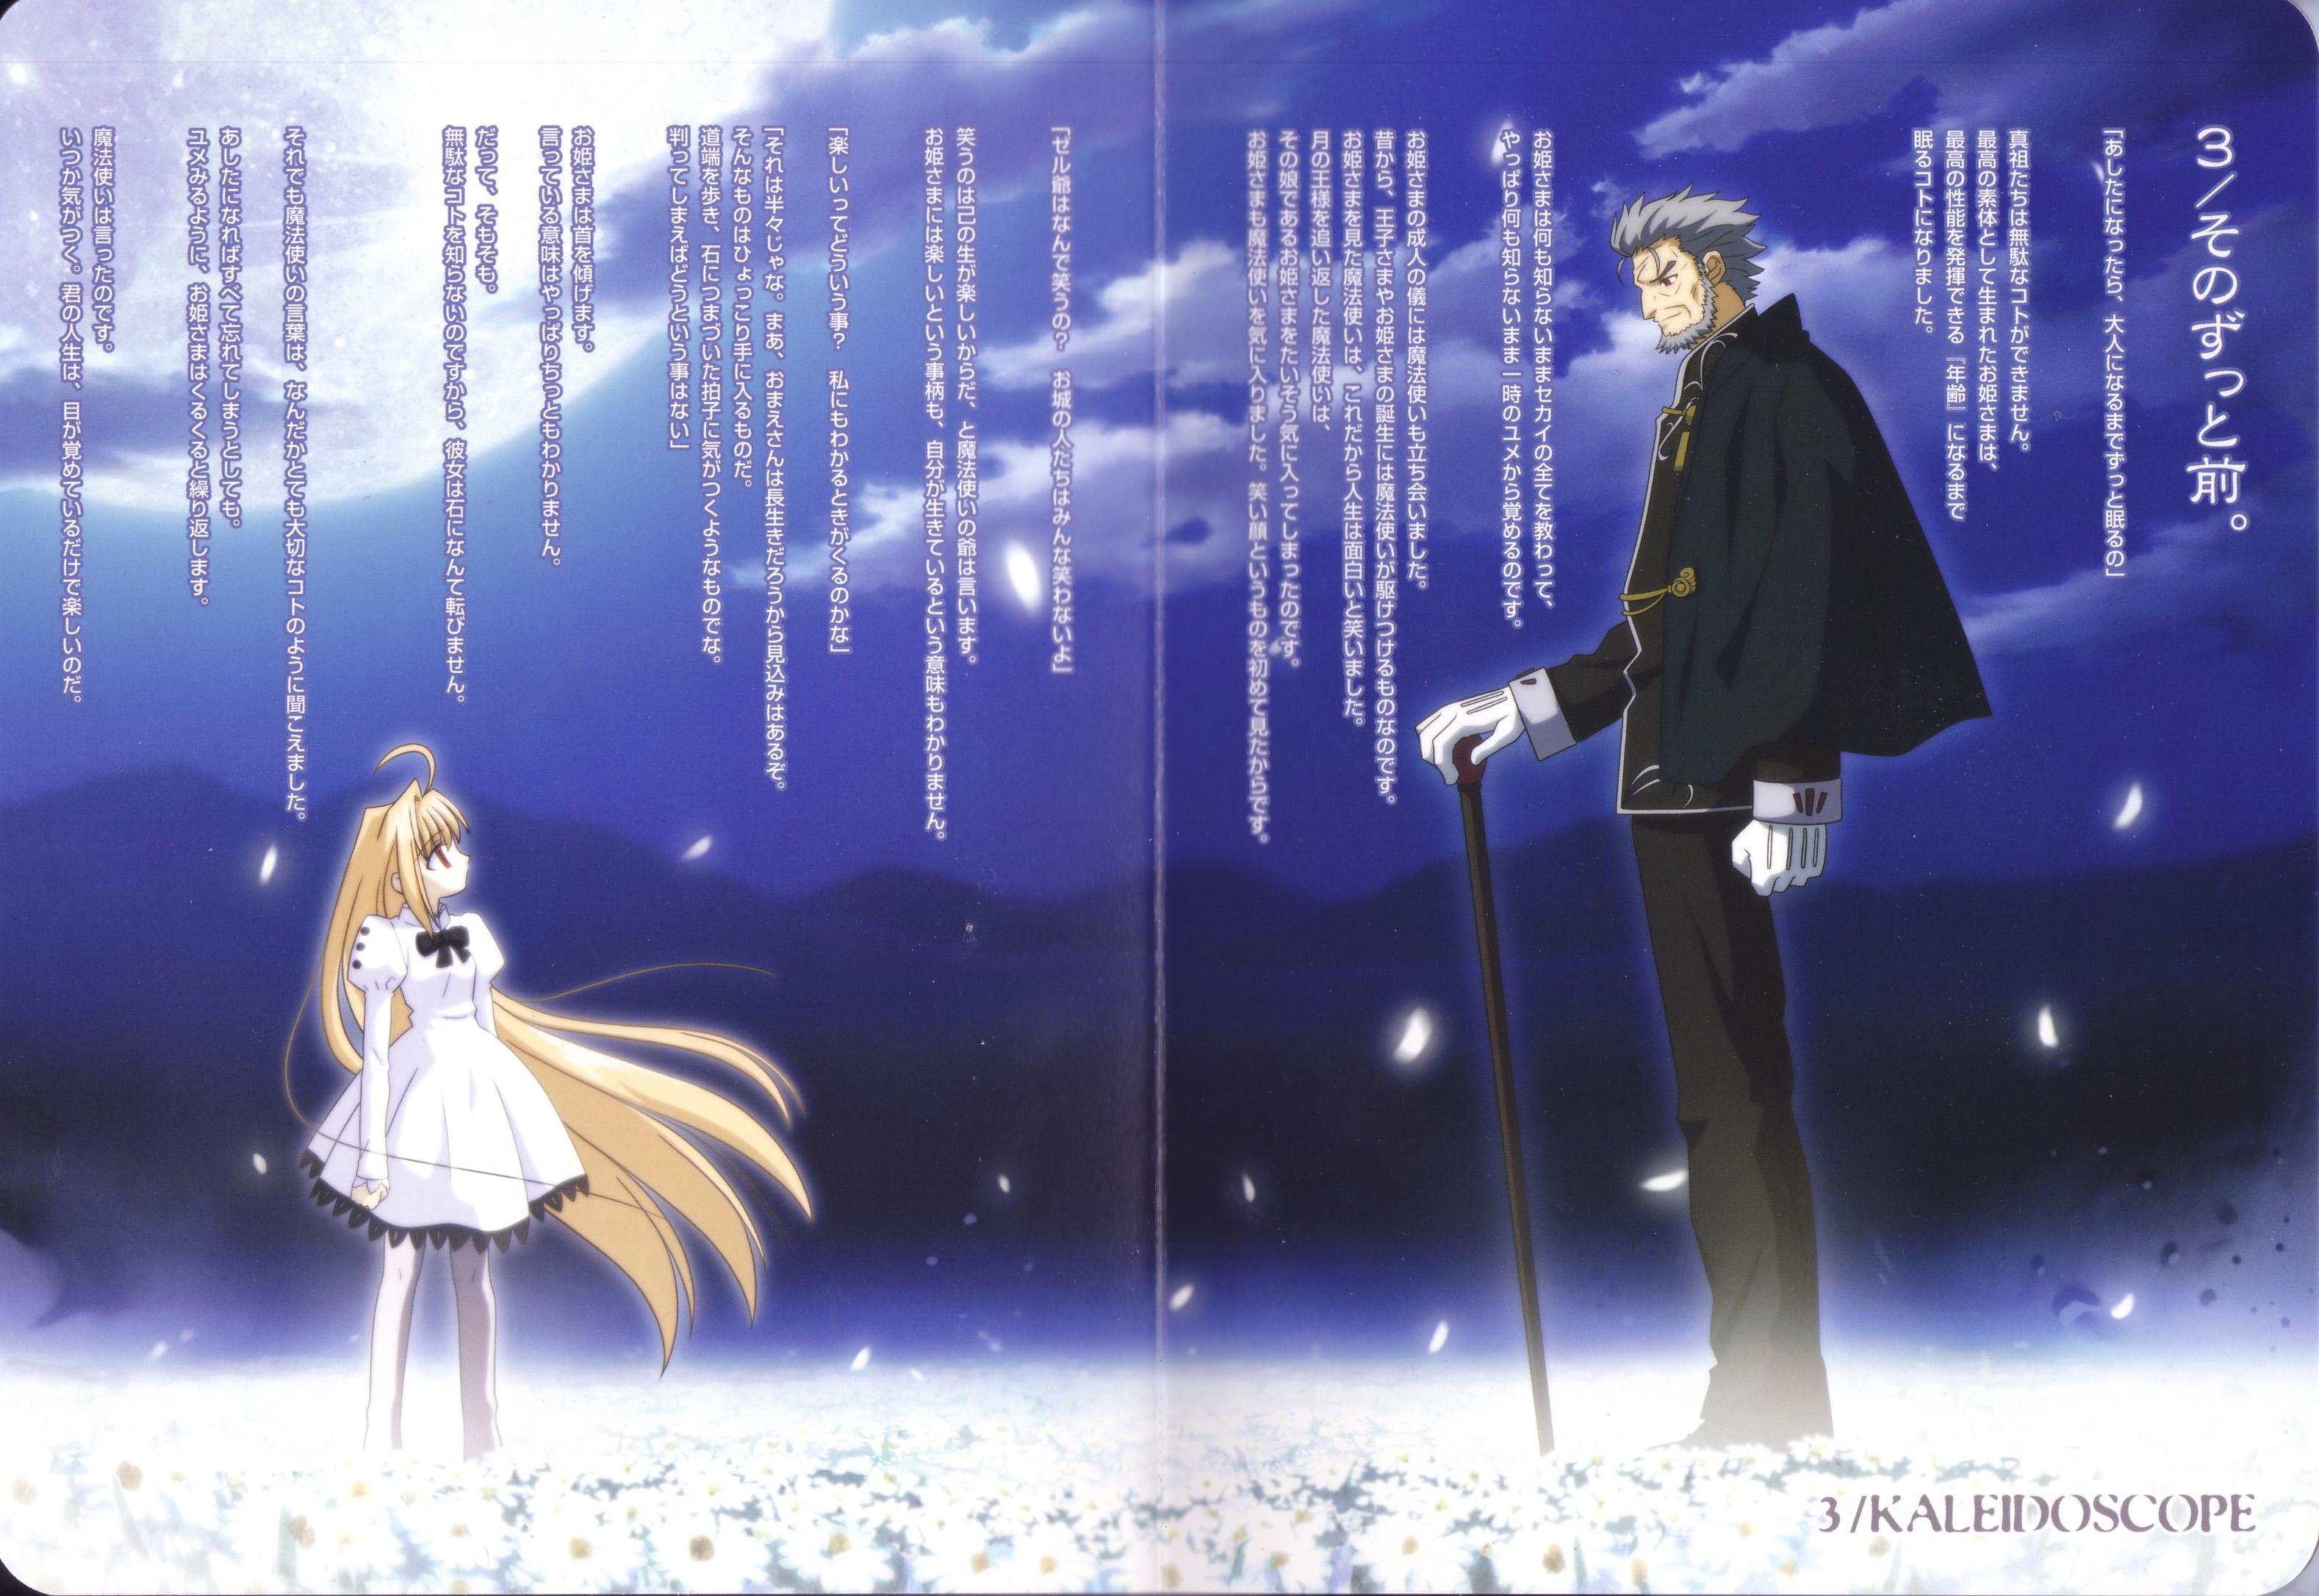 tsukihime  lunar legend moon princess  image  367391